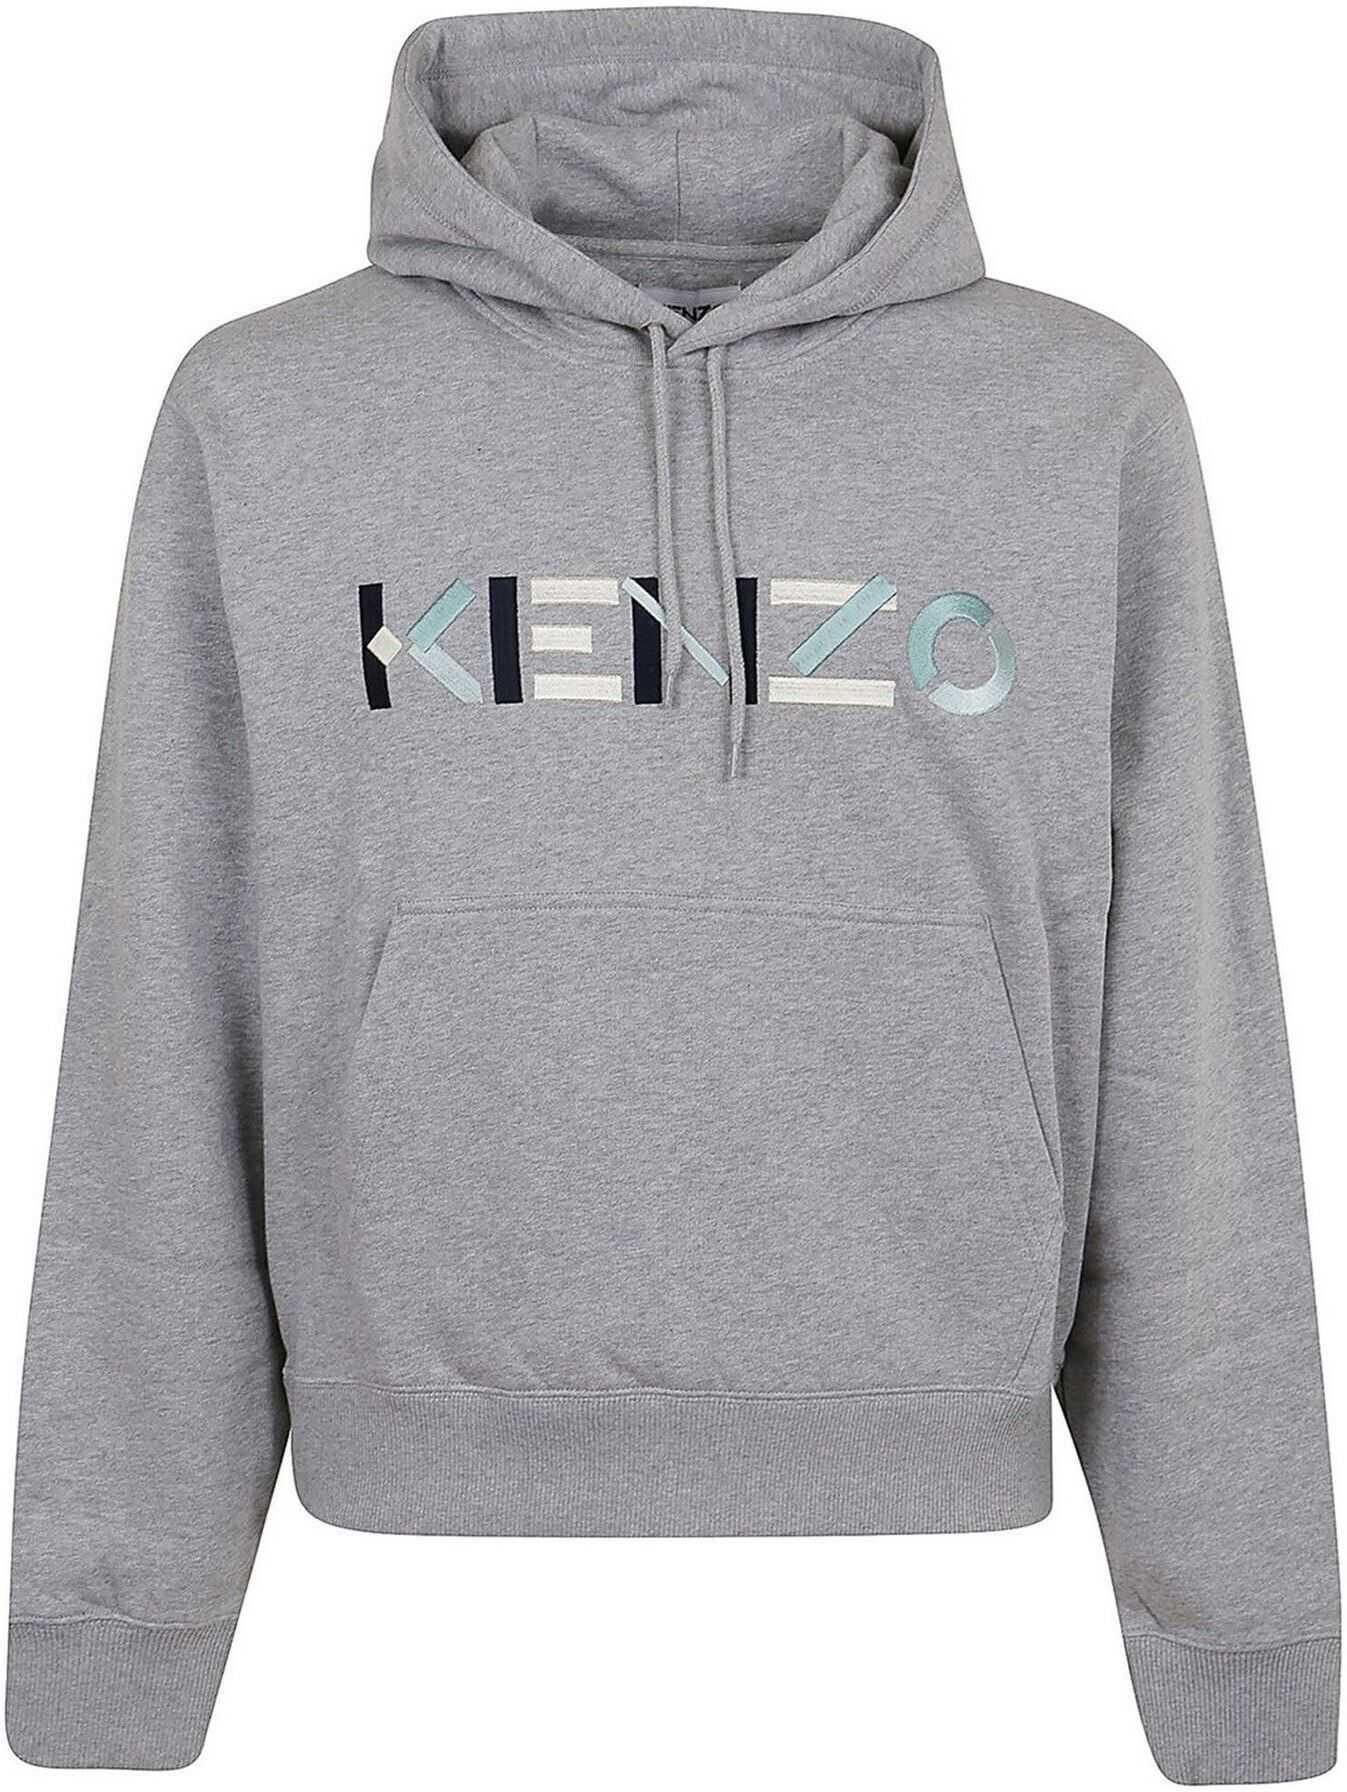 Kenzo Multicolor Logo Hoodie Grey imagine